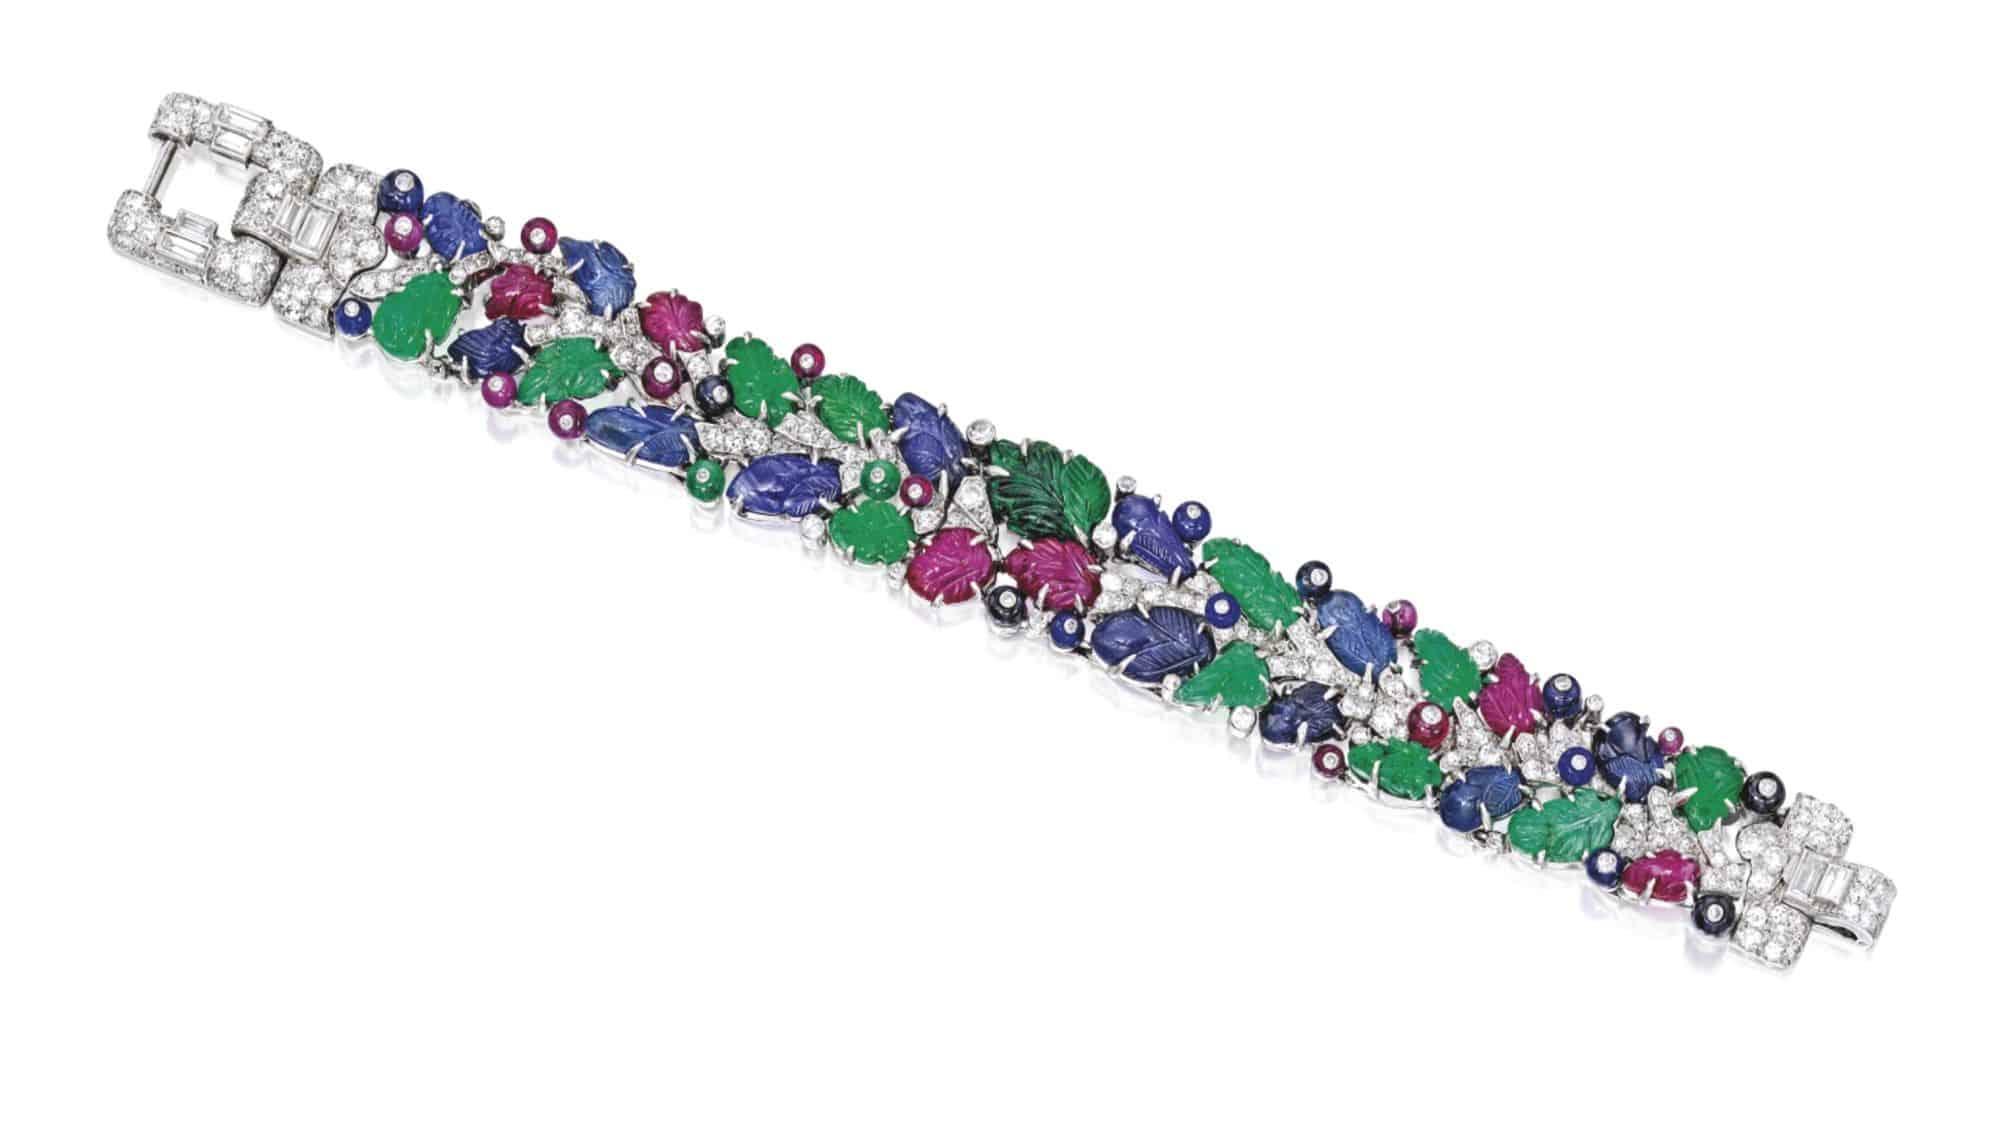 Lot 408 - A Rare Platinum, Colored Stone and Diamond 'Tutti Frutti' Bracelet, Cartier, London